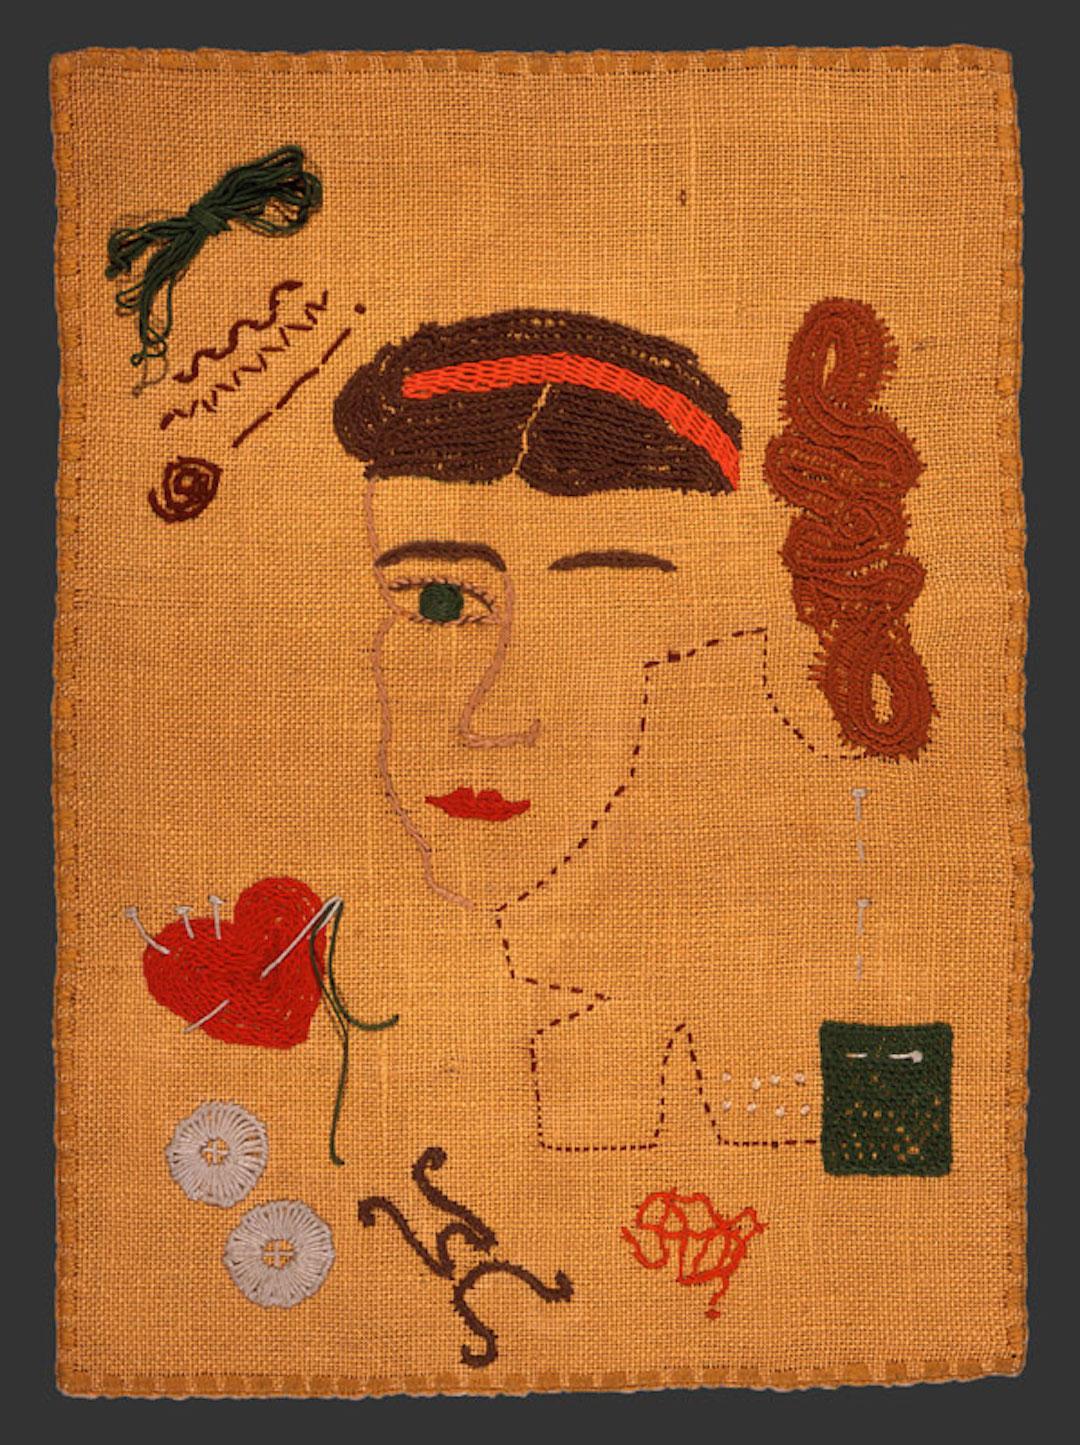 Mariska Karasz vintage embroidery from the 1940s